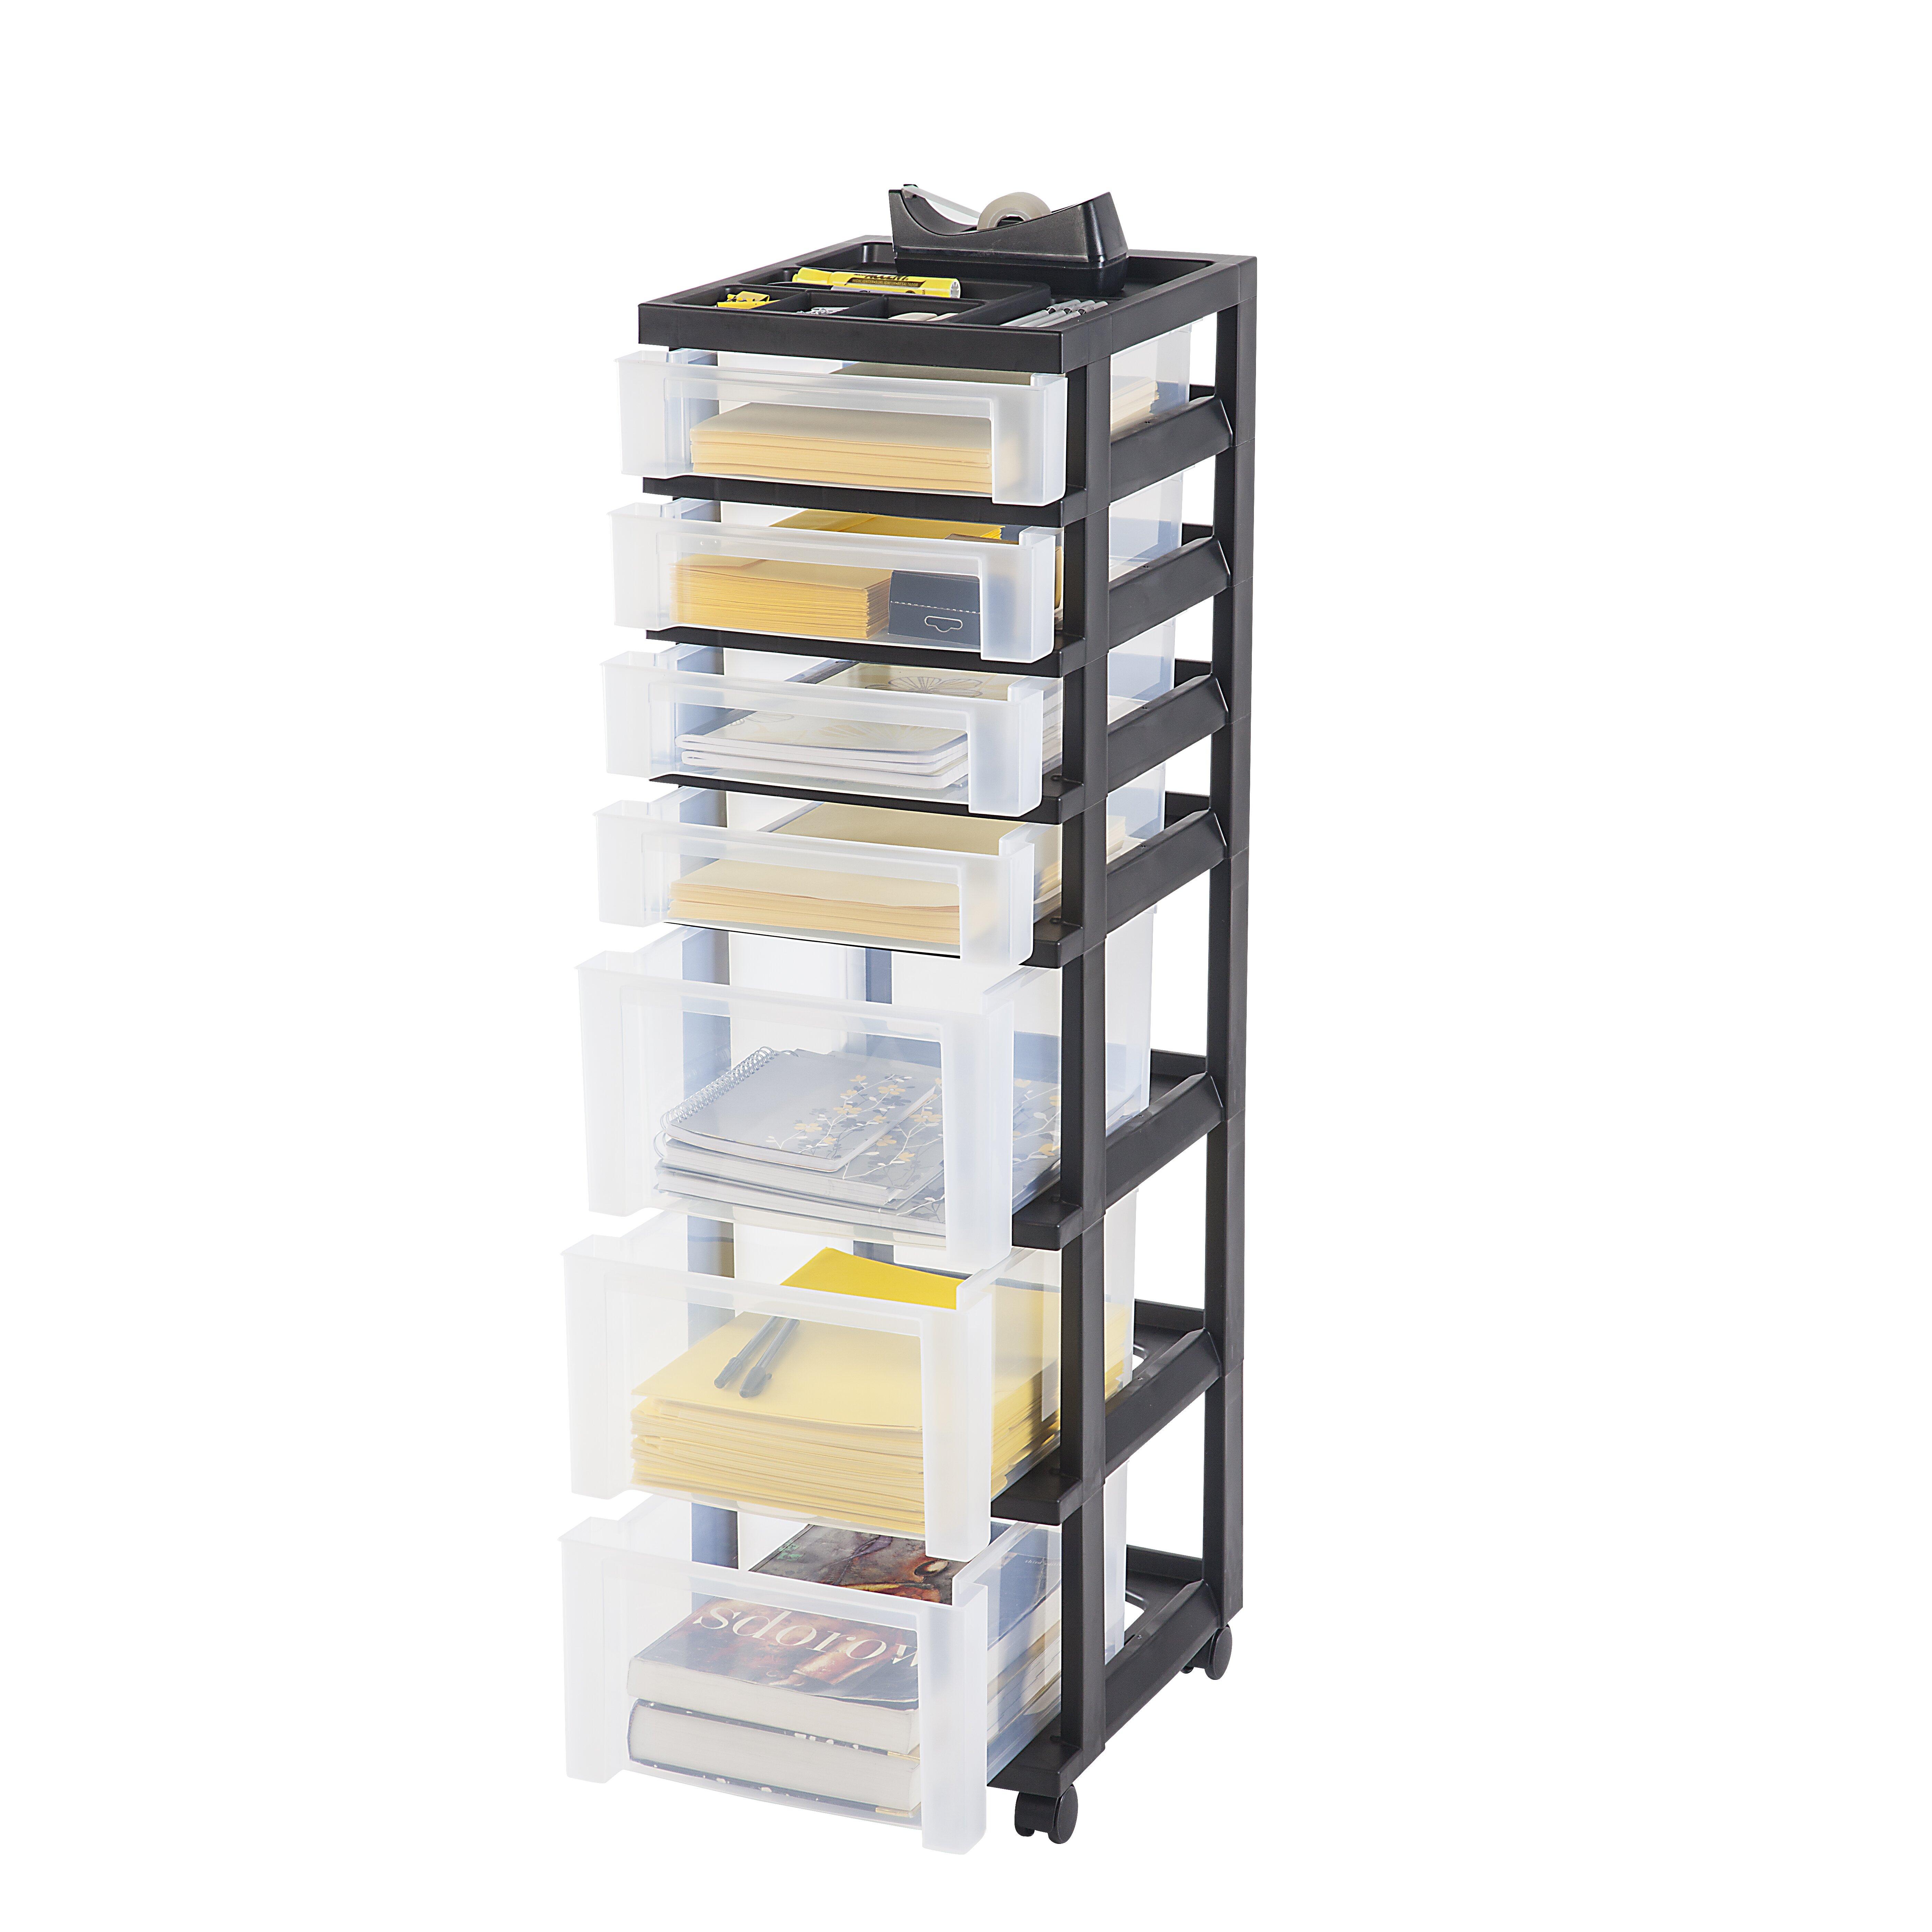 Wayfair basics wayfair basics 7 drawer storage chest for Wayfair store